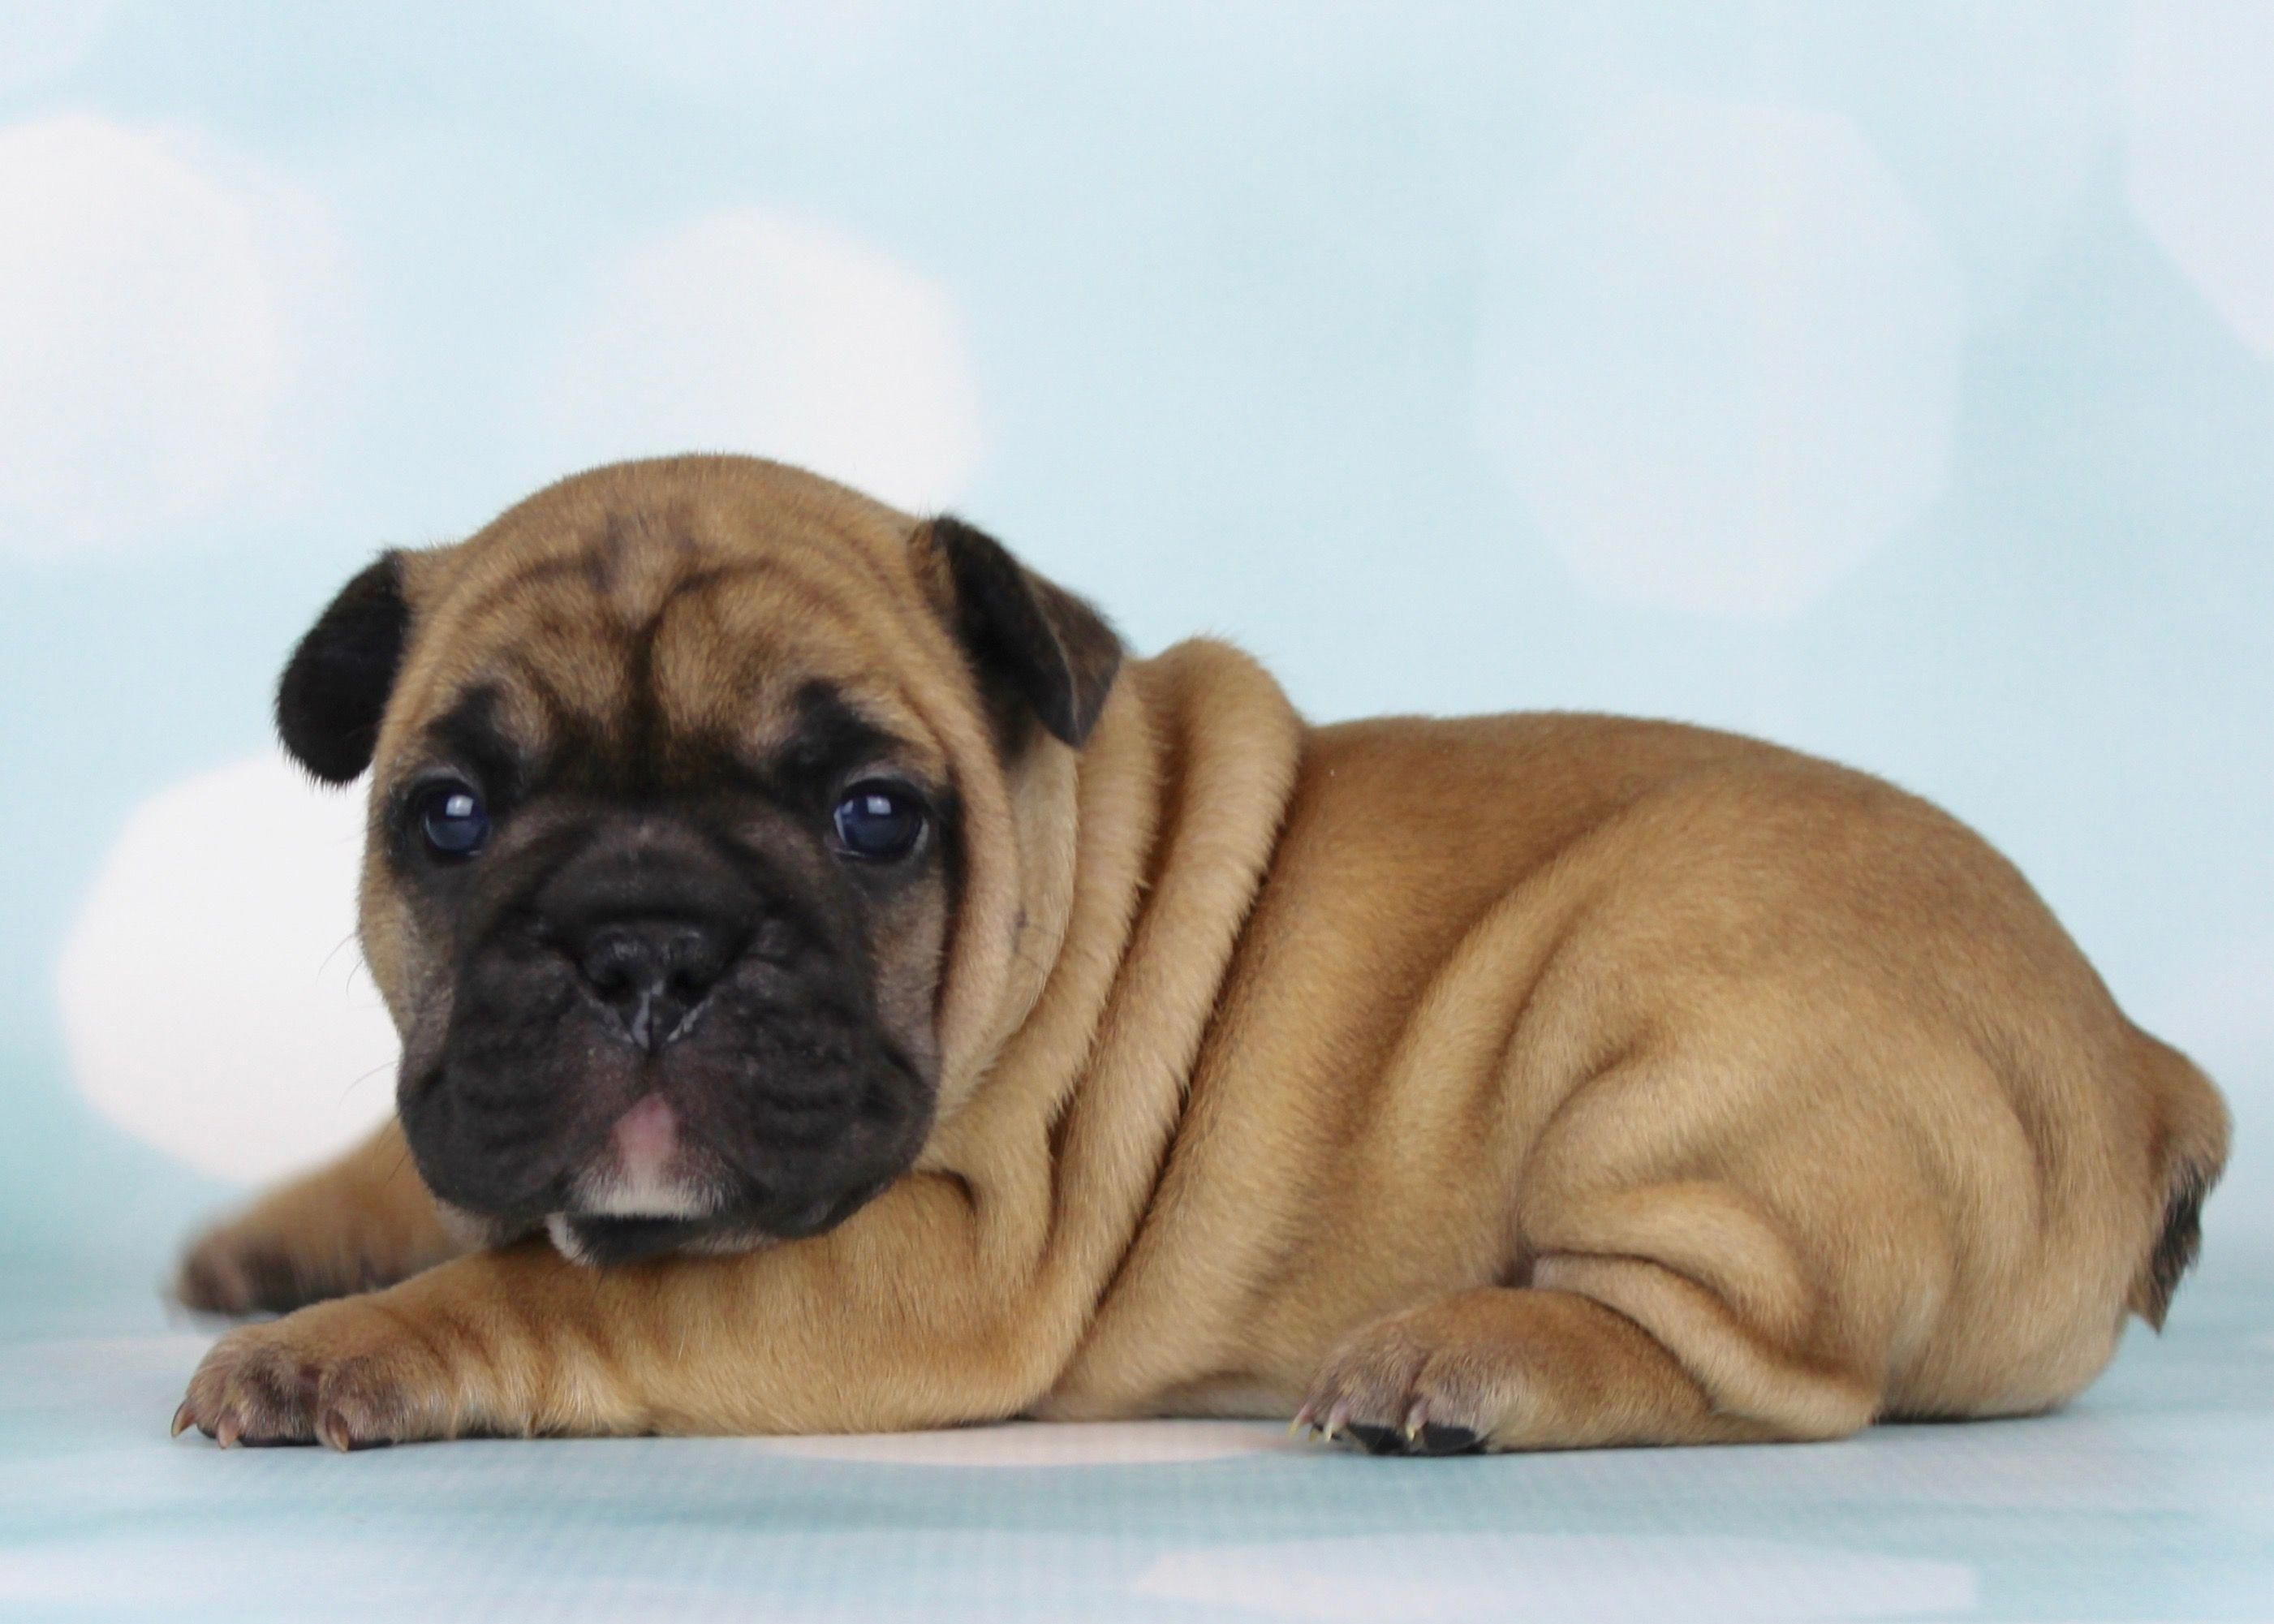 French Bulldog puppy - Walter #FrenchBulldog#Frenchie#Frenchies#frenchbulldogs#bluefrenchbulldogpuppy#puppies#Blue#FrenchBulldogPuppiesforsale#cutedogs#cutepuppies#cutefrenchbulldog#bulldogsforsale #frenchbulldogblue #walterthefrenchbulldog French Bulldog puppy - Walter #FrenchBulldog#Frenchie#Frenchies#frenchbulldogs#bluefrenchbulldogpuppy#puppies#Blue#FrenchBulldogPuppiesforsale#cutedogs#cutepuppies#cutefrenchbulldog#bulldogsforsale #frenchbulldogblue